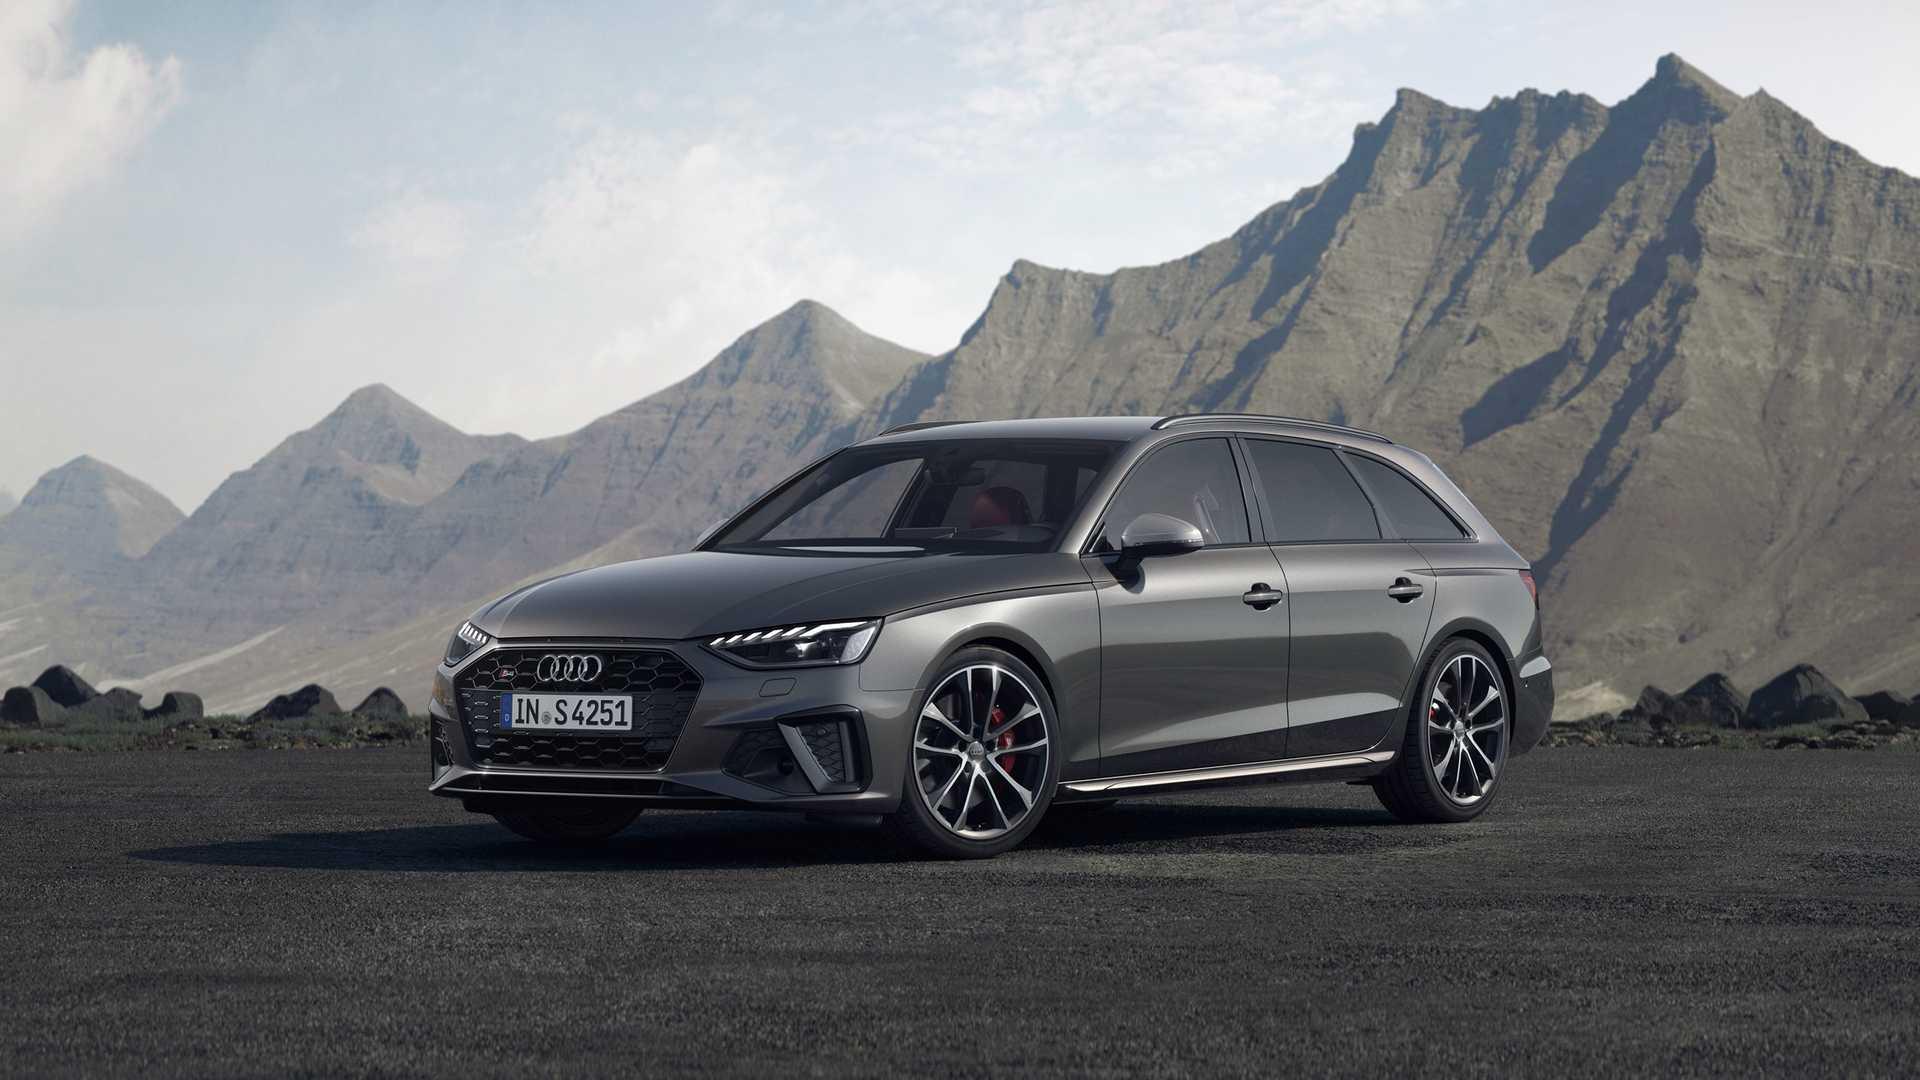 2020 Audi S4 Avant TDI (Color: Daytona Gray) Front Three-Quarter Wallpapers (3)